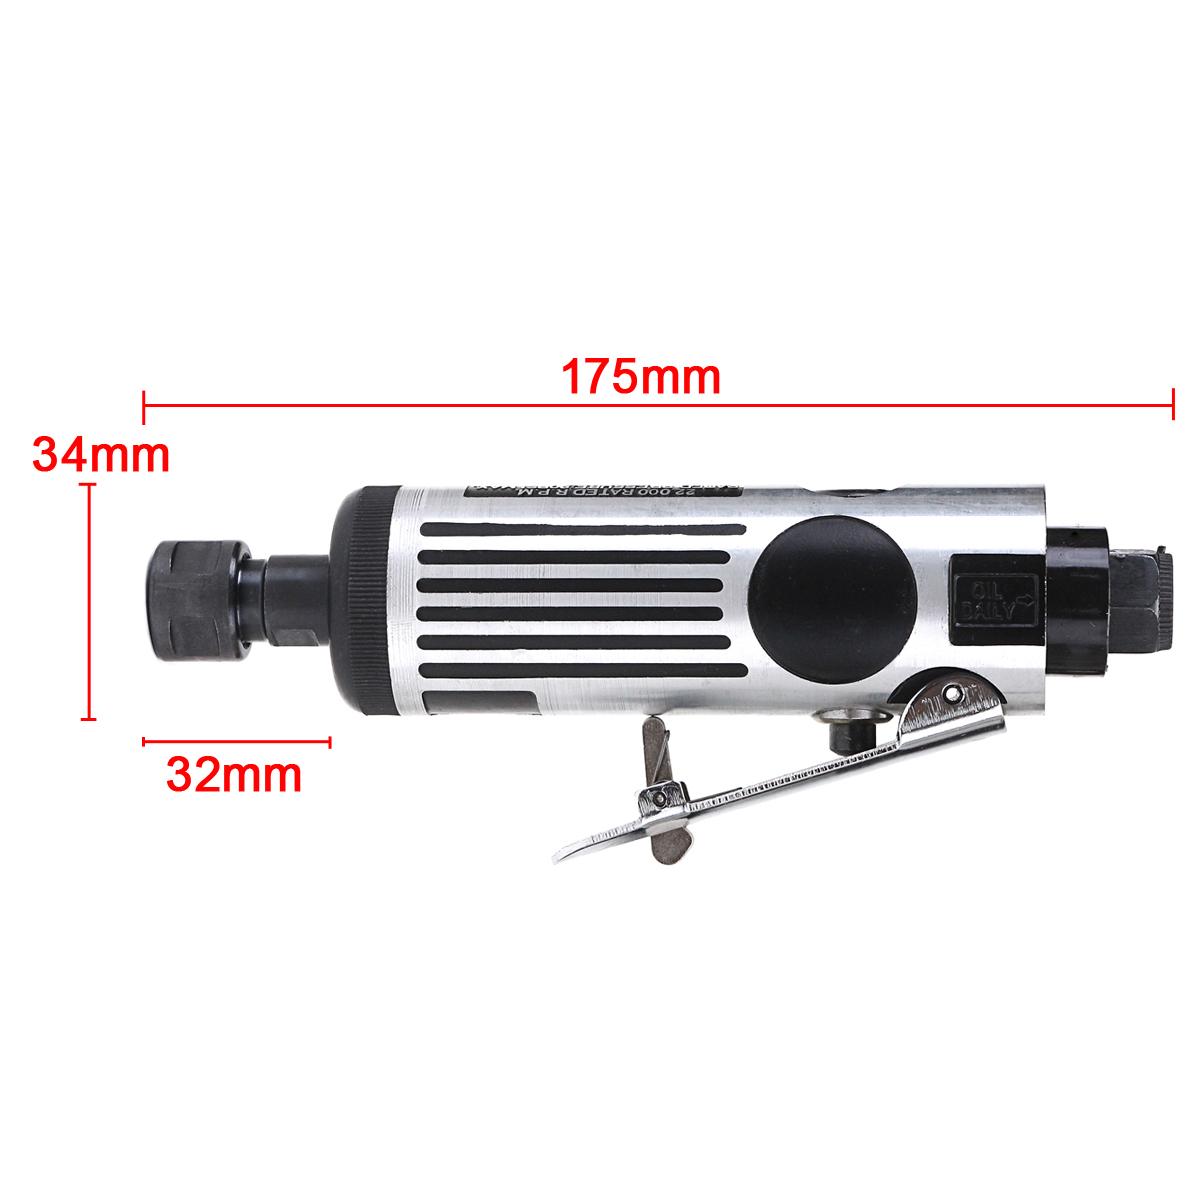 Raitool™ 25000 RPM Air Grinder Mini Air Angle Die Grinder Kit Pneumatic Tools Air Grinding Set Air Tools